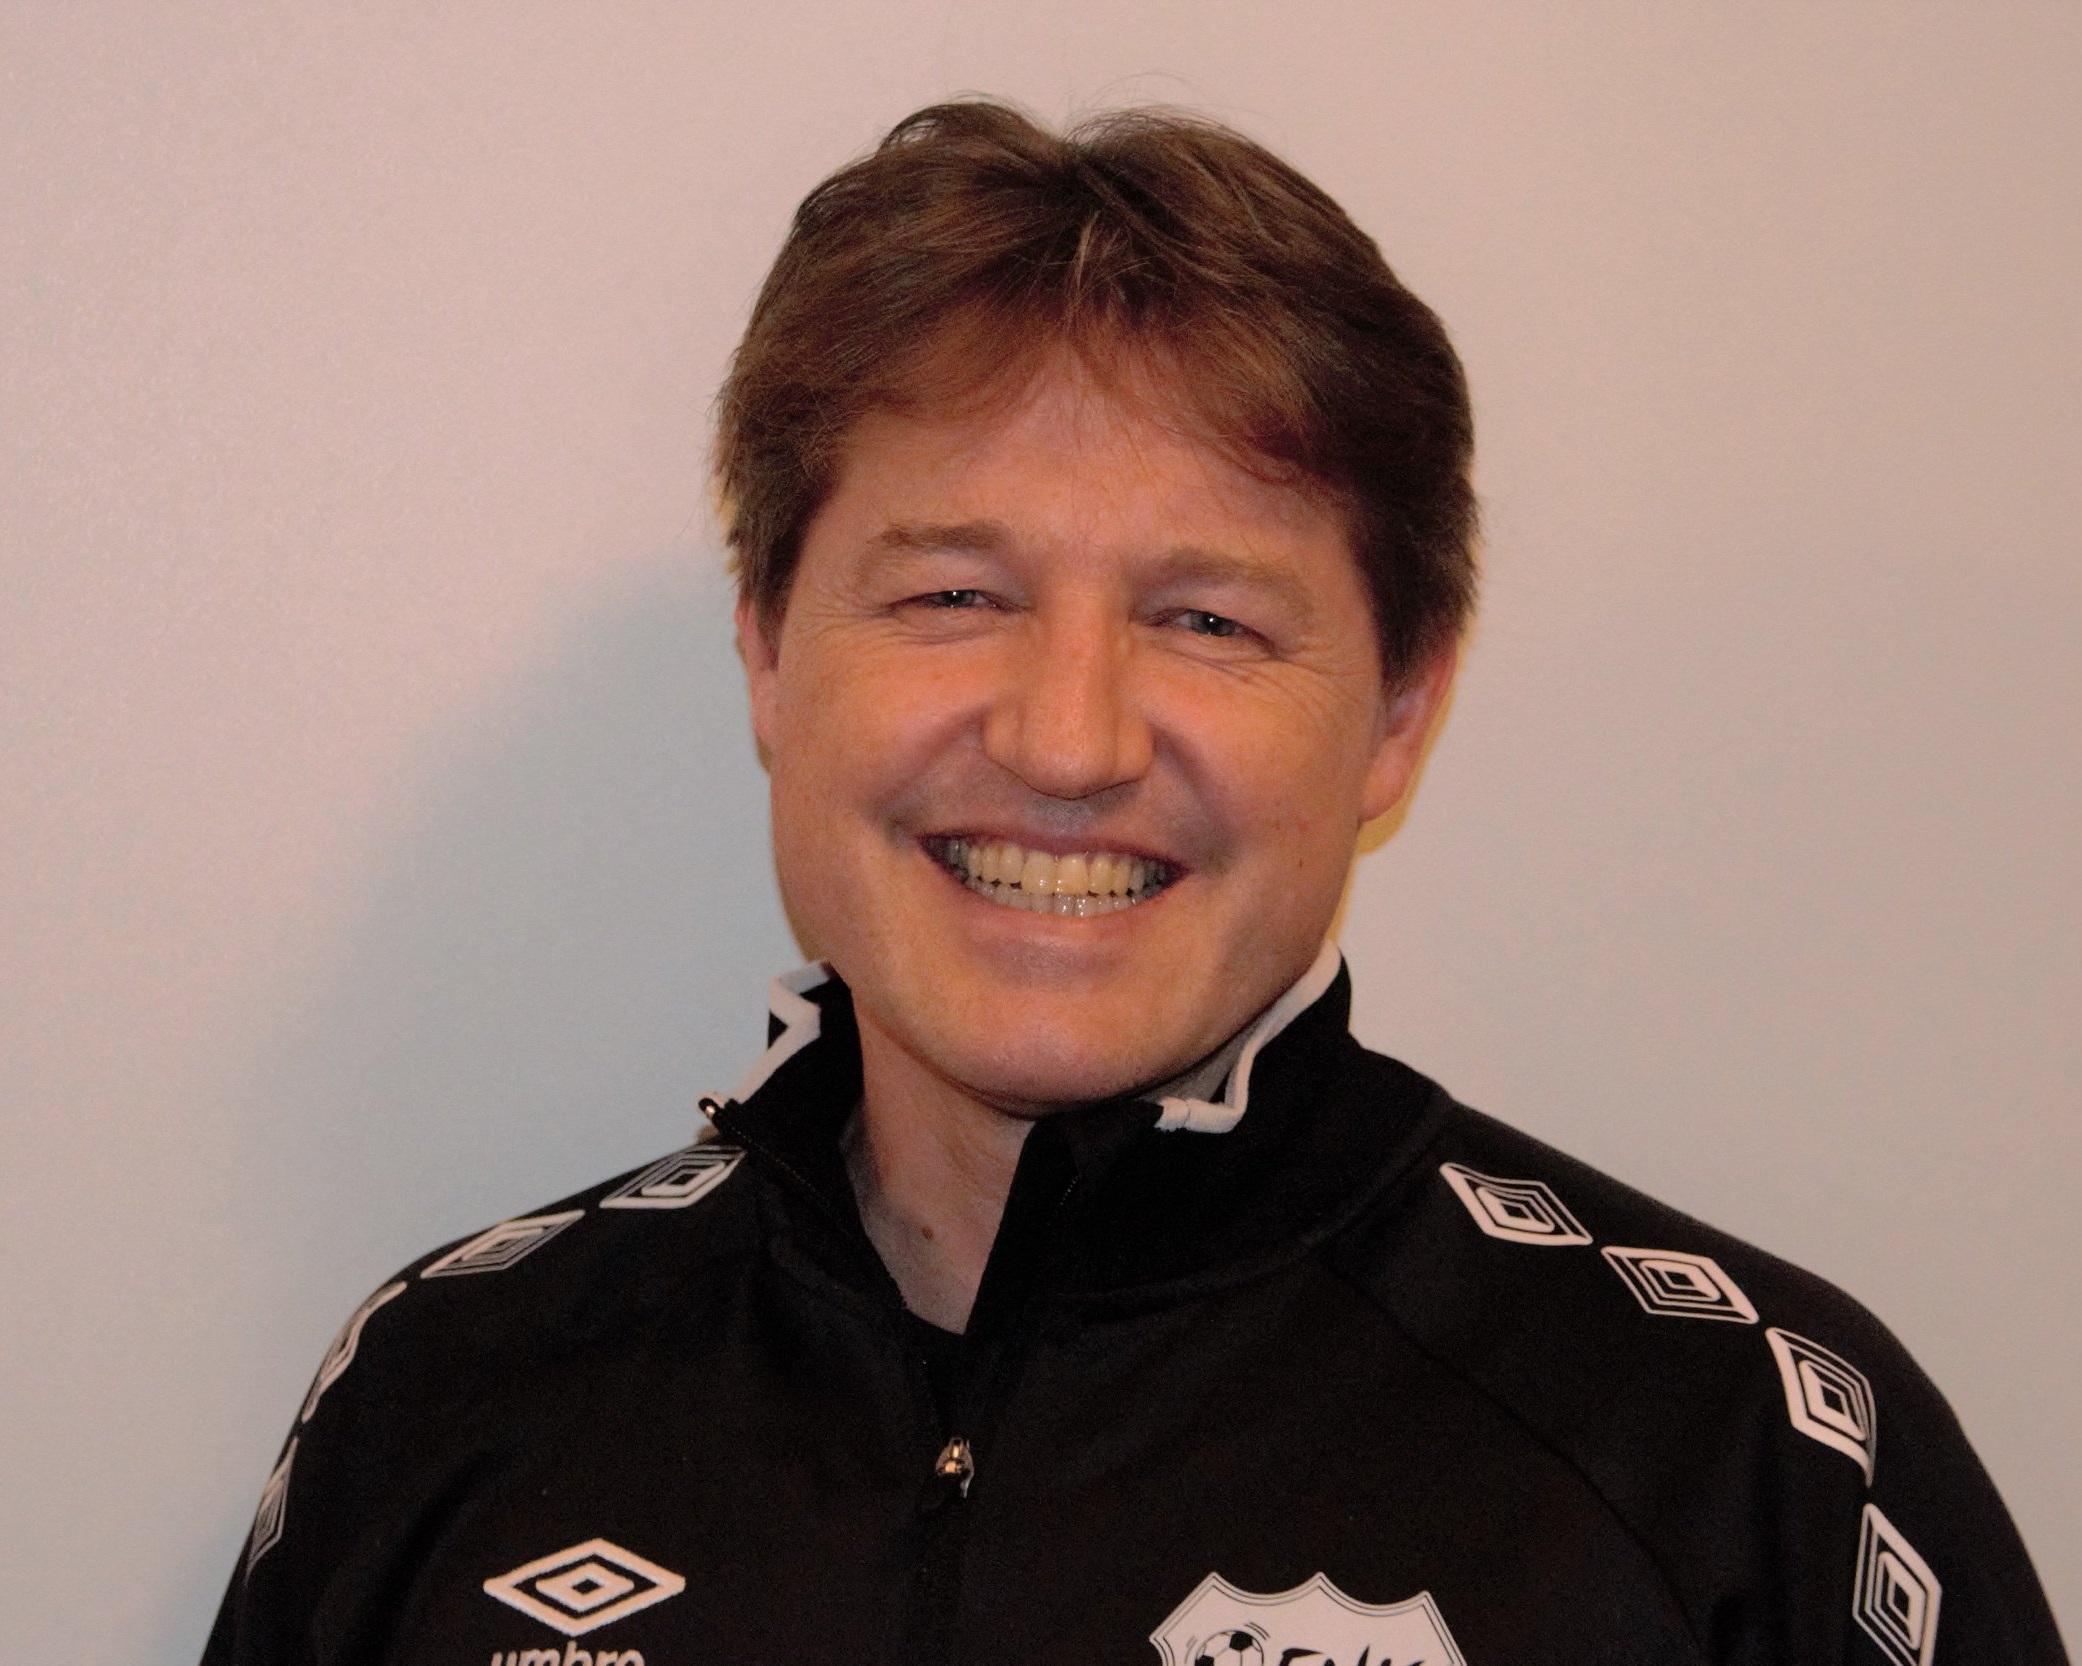 Bjørn Brunborg - Tlf: 416 52 364